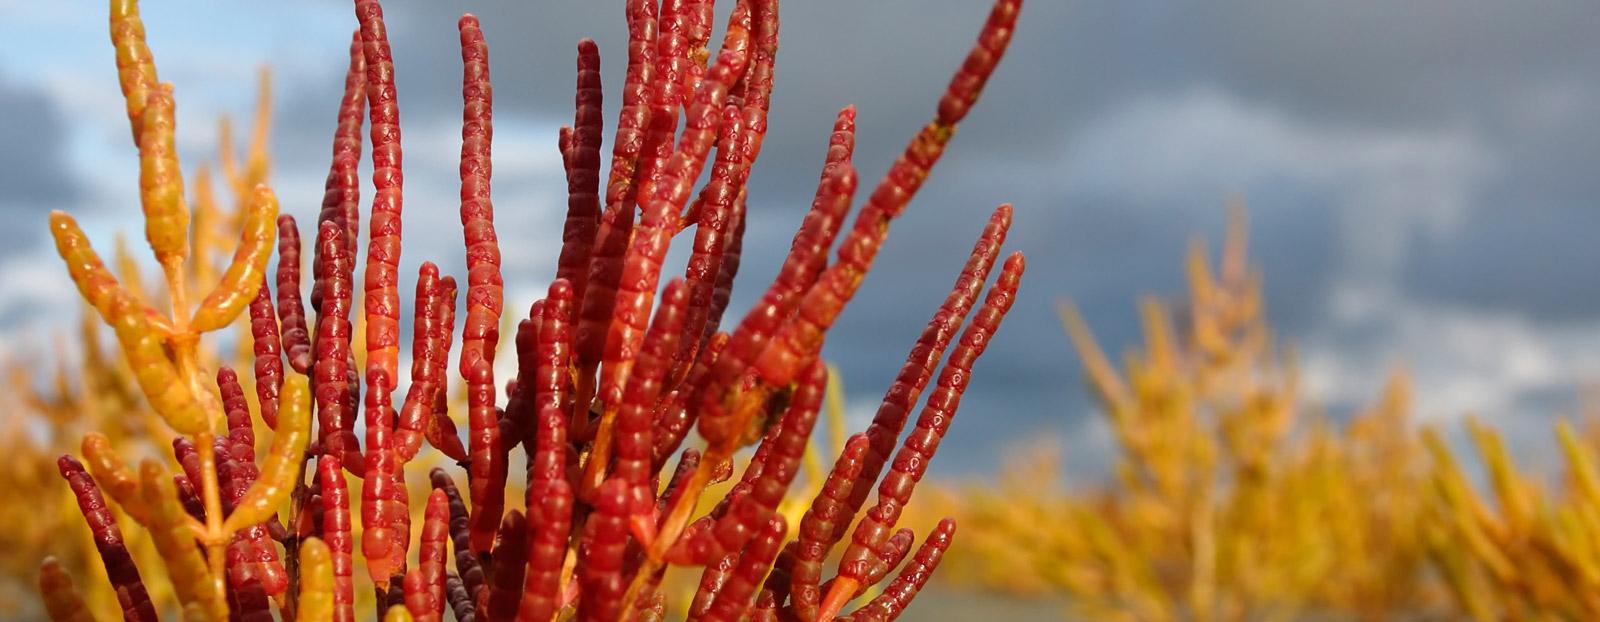 Salicornia in its natural habitat